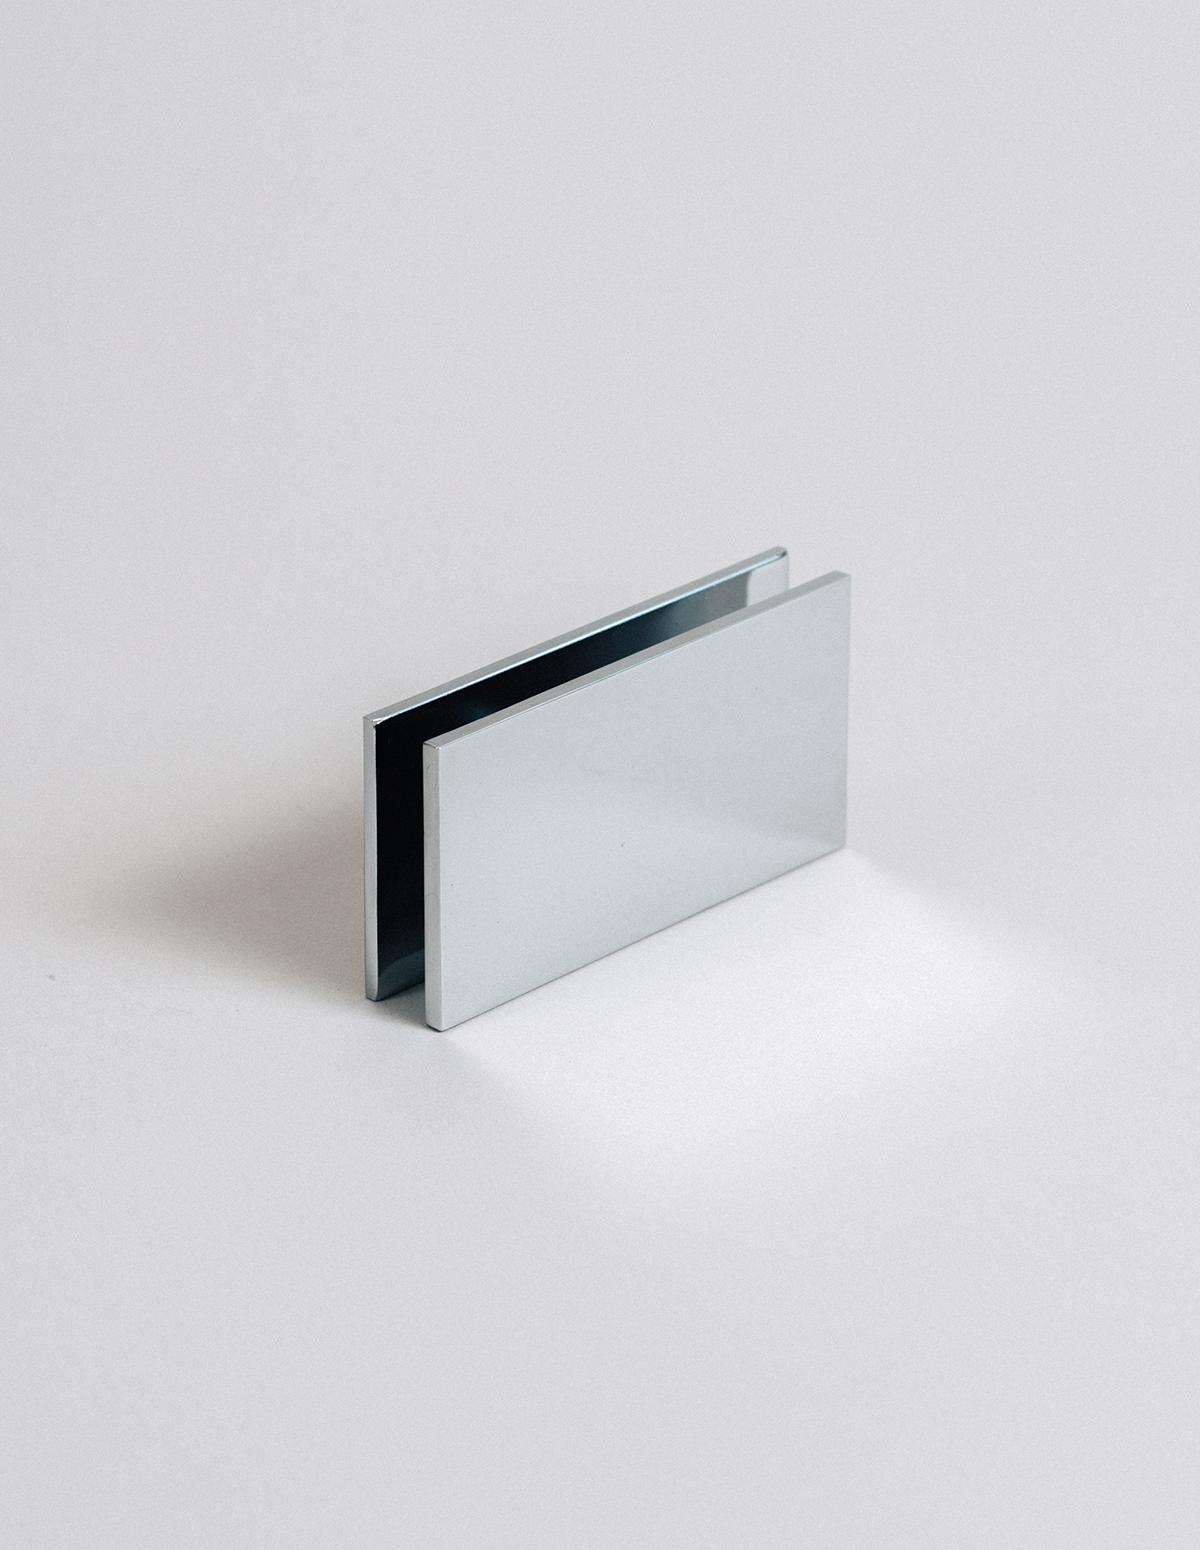 Optimum-Studios-Architectural-Glass-Metal-HardwarePage-GlassClip2-042216